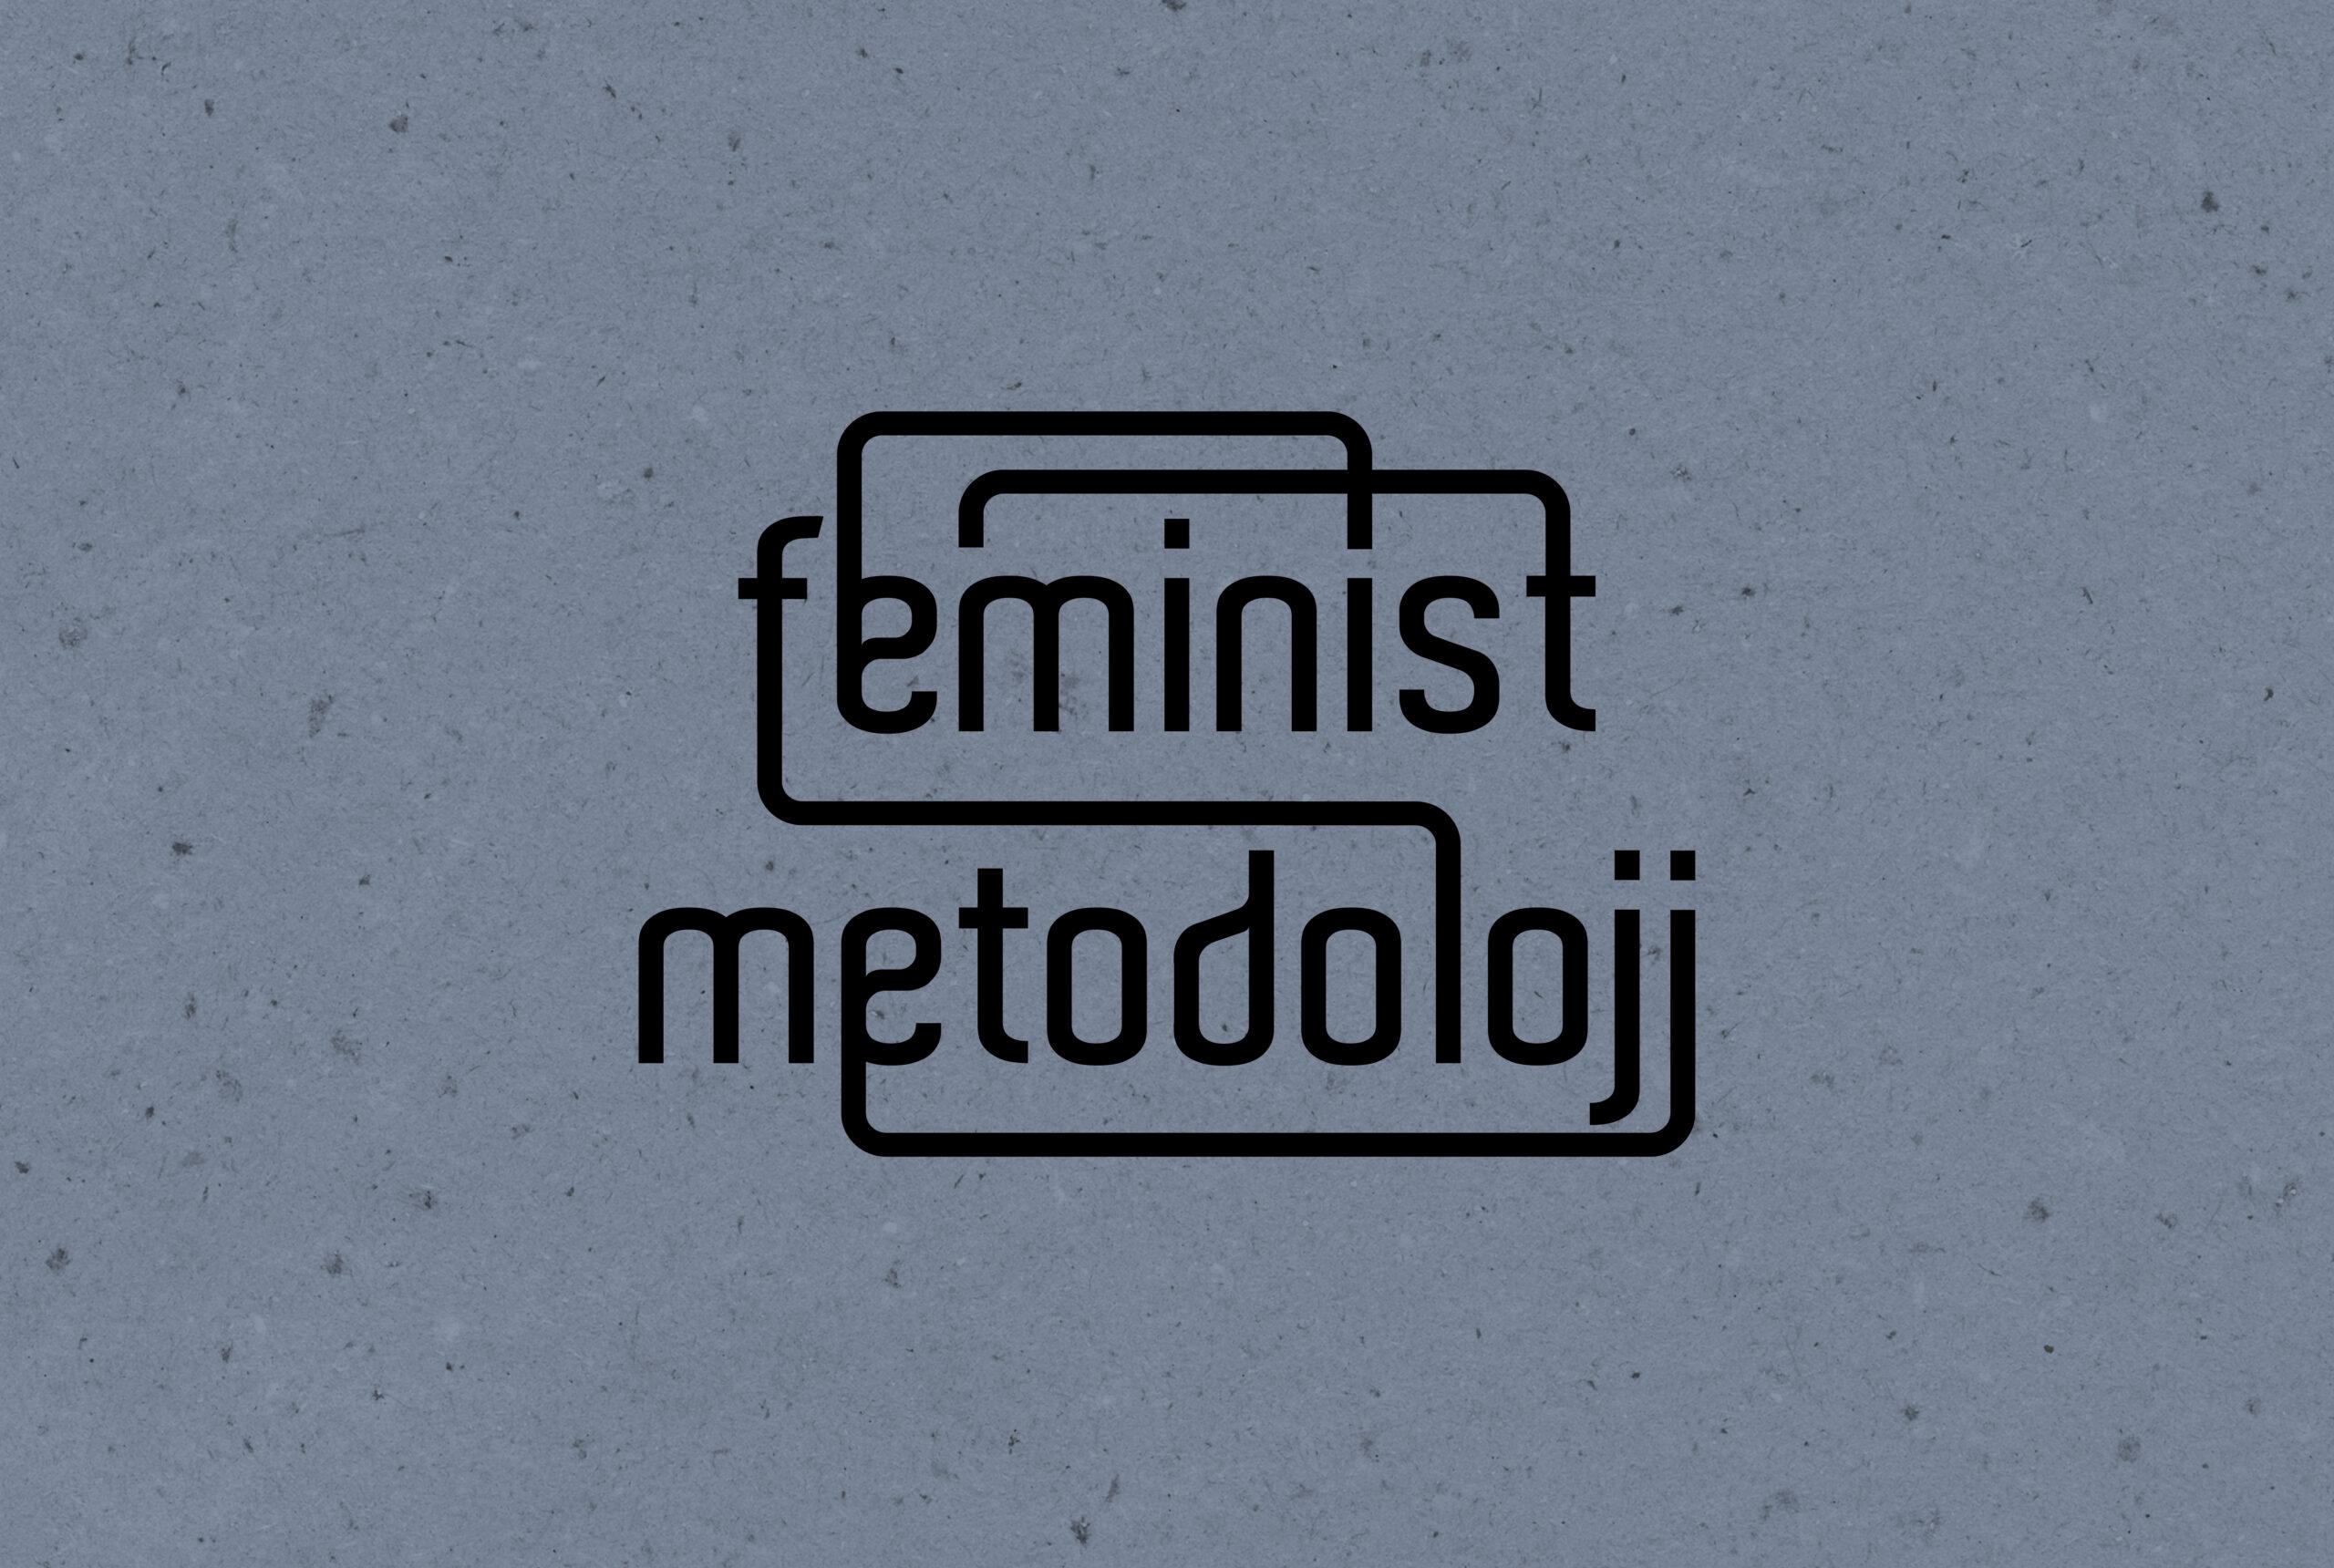 Feminist Metodoloji